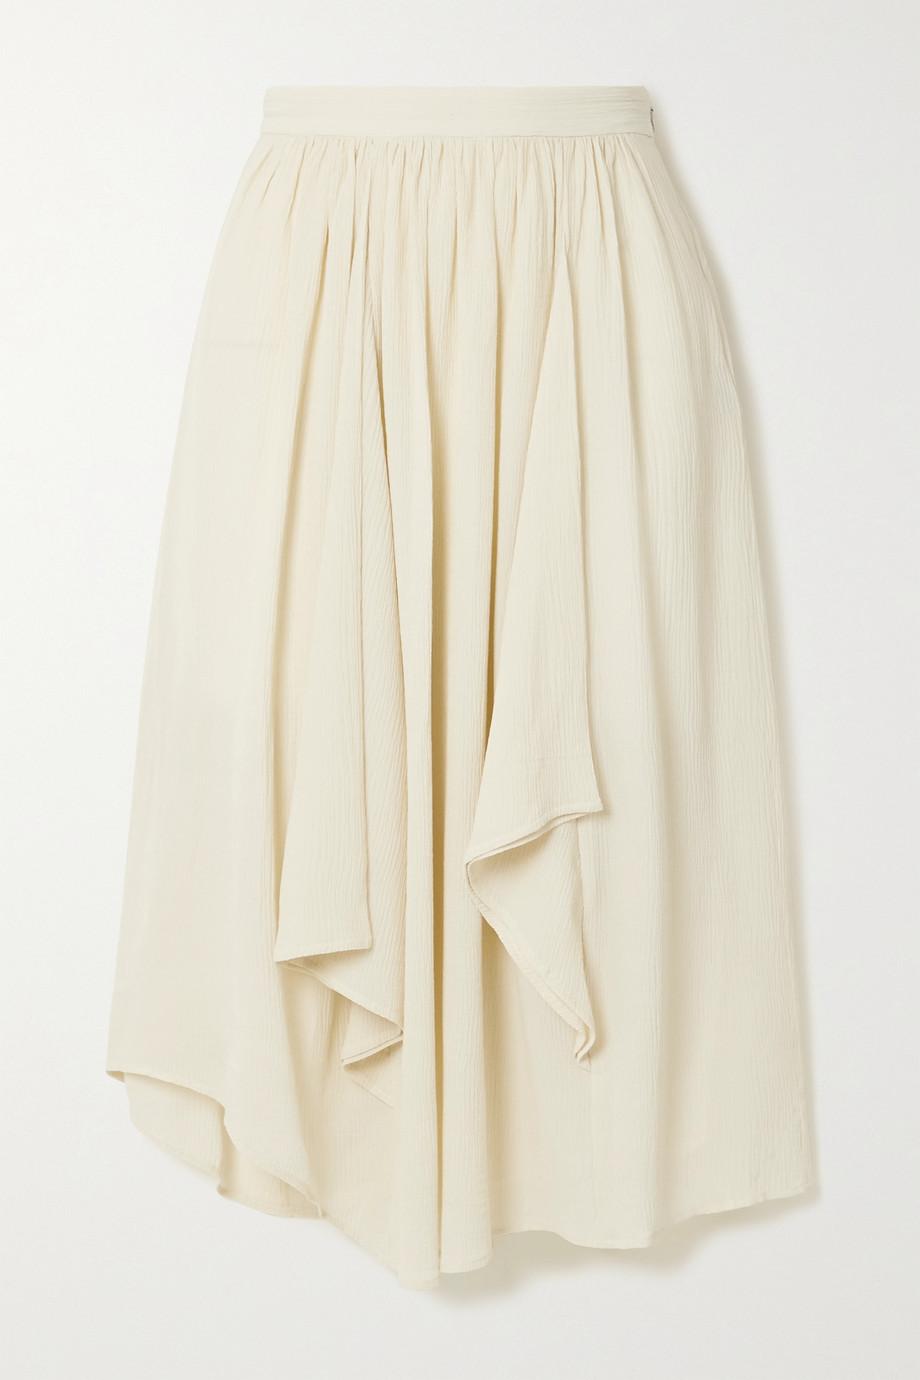 Isabel Marant Darne 垂坠棉丝混纺顺纡绉中长半身裙